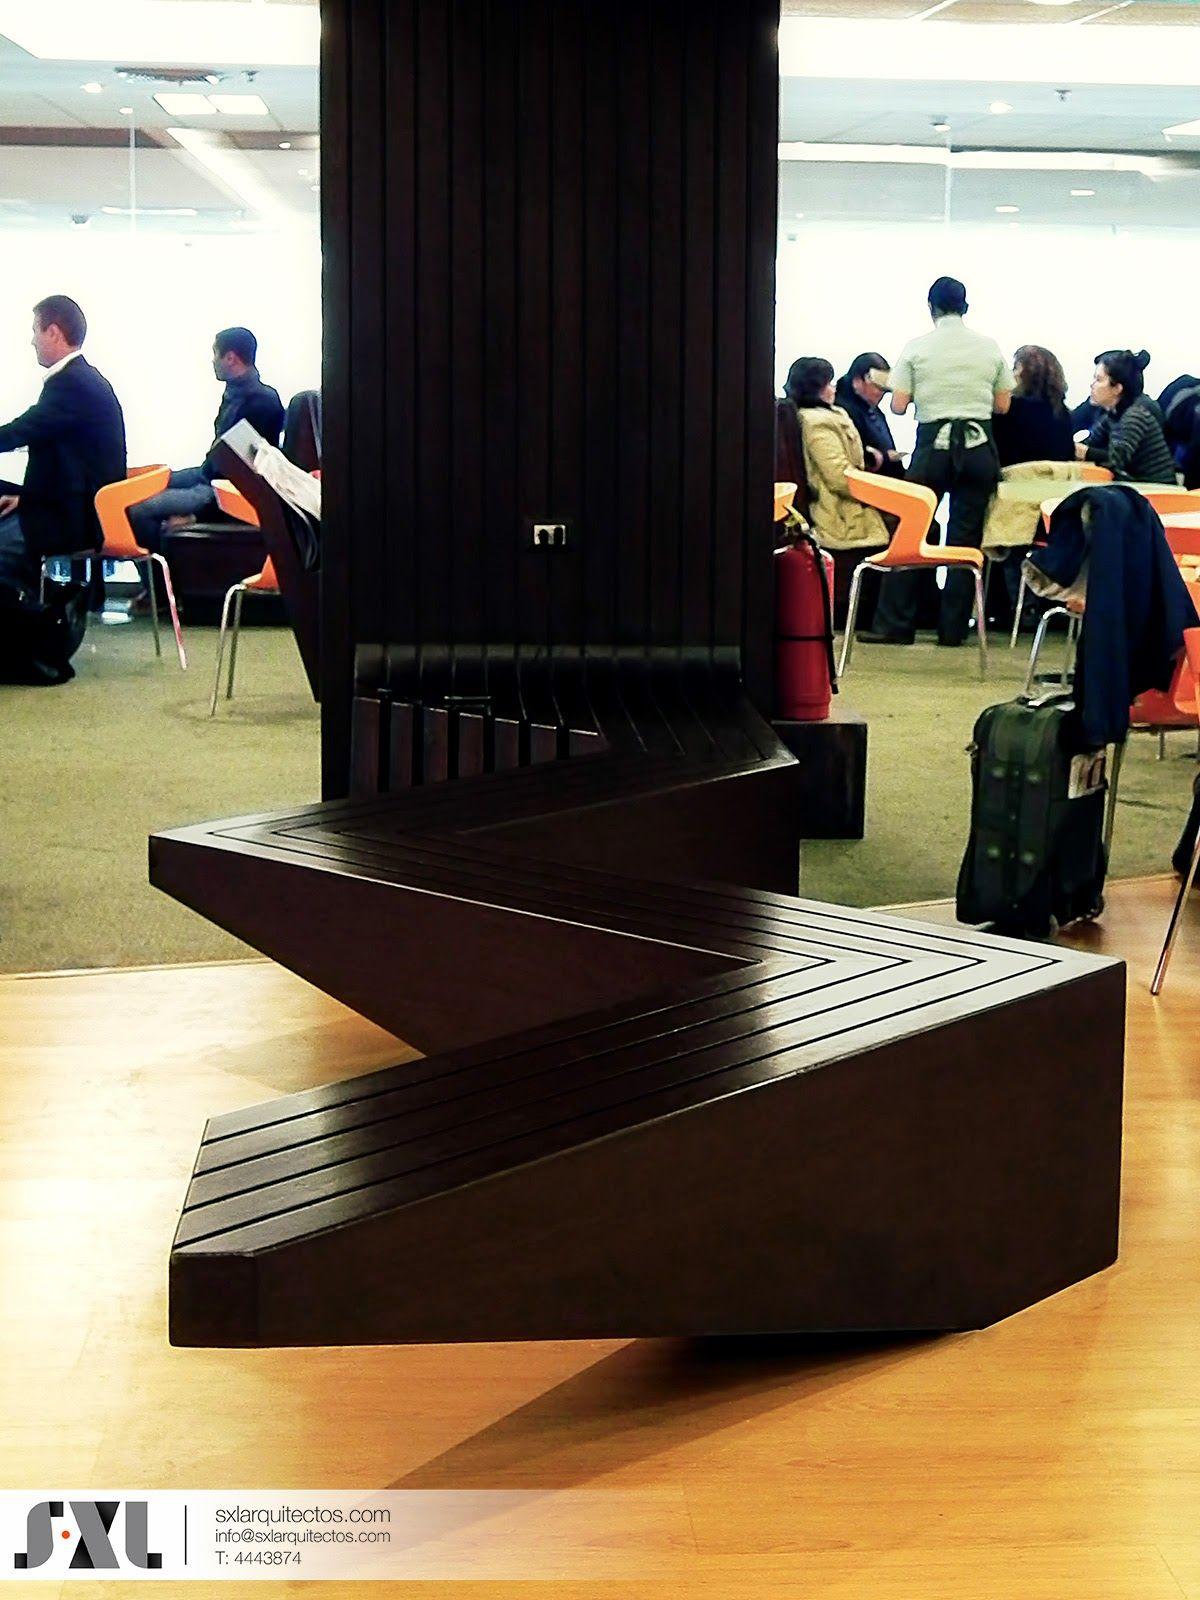 Diseño Restaurante 4d Aeropuerto - S-XL Arquitectos